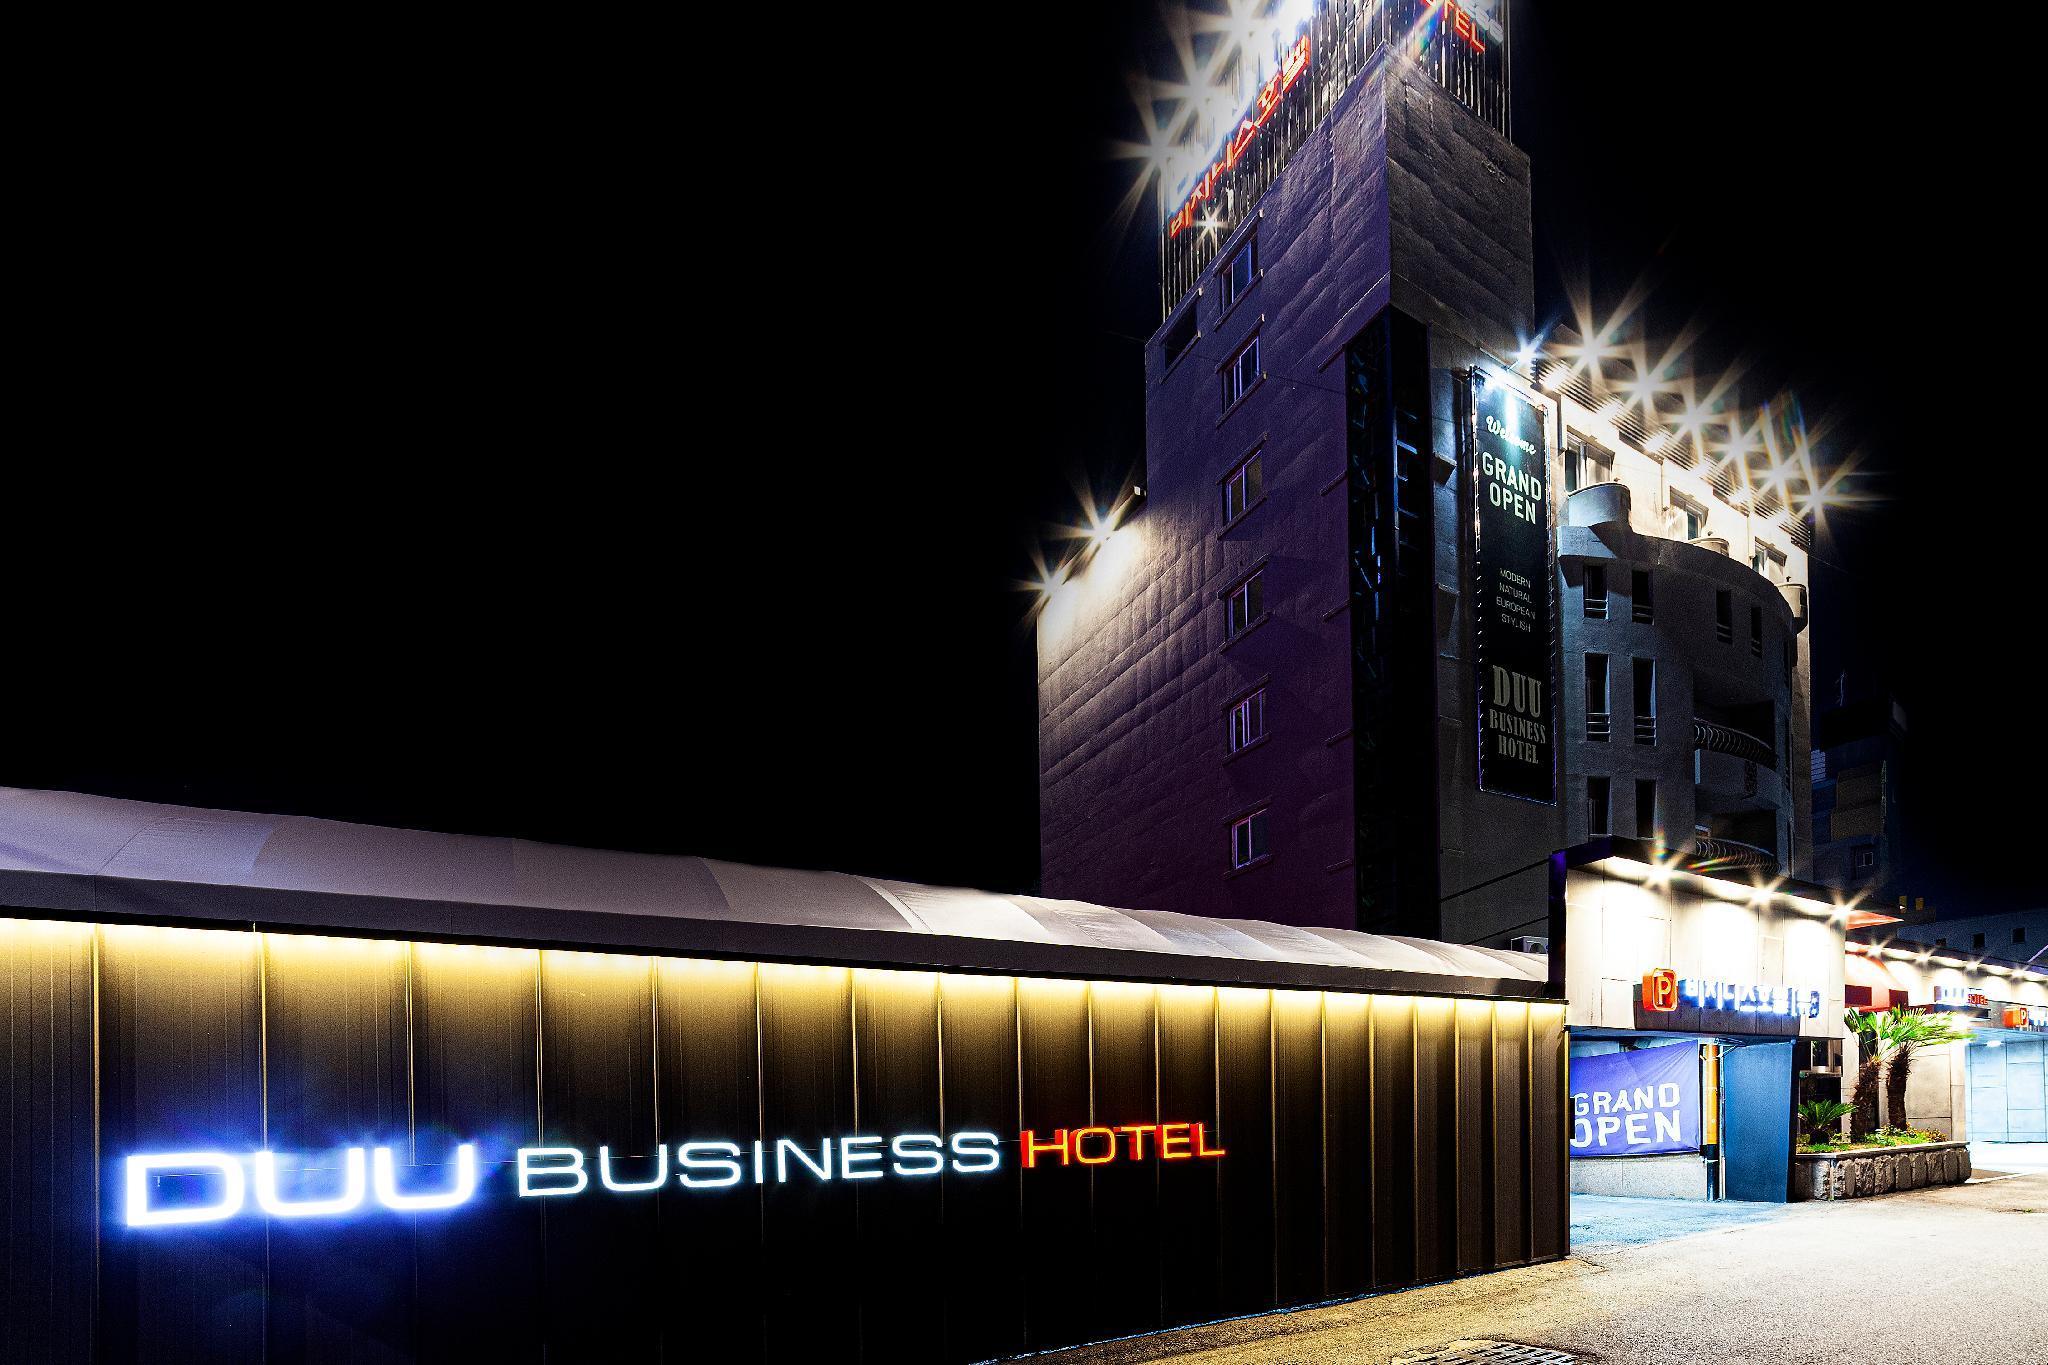 Business Hotel Duu, Buk